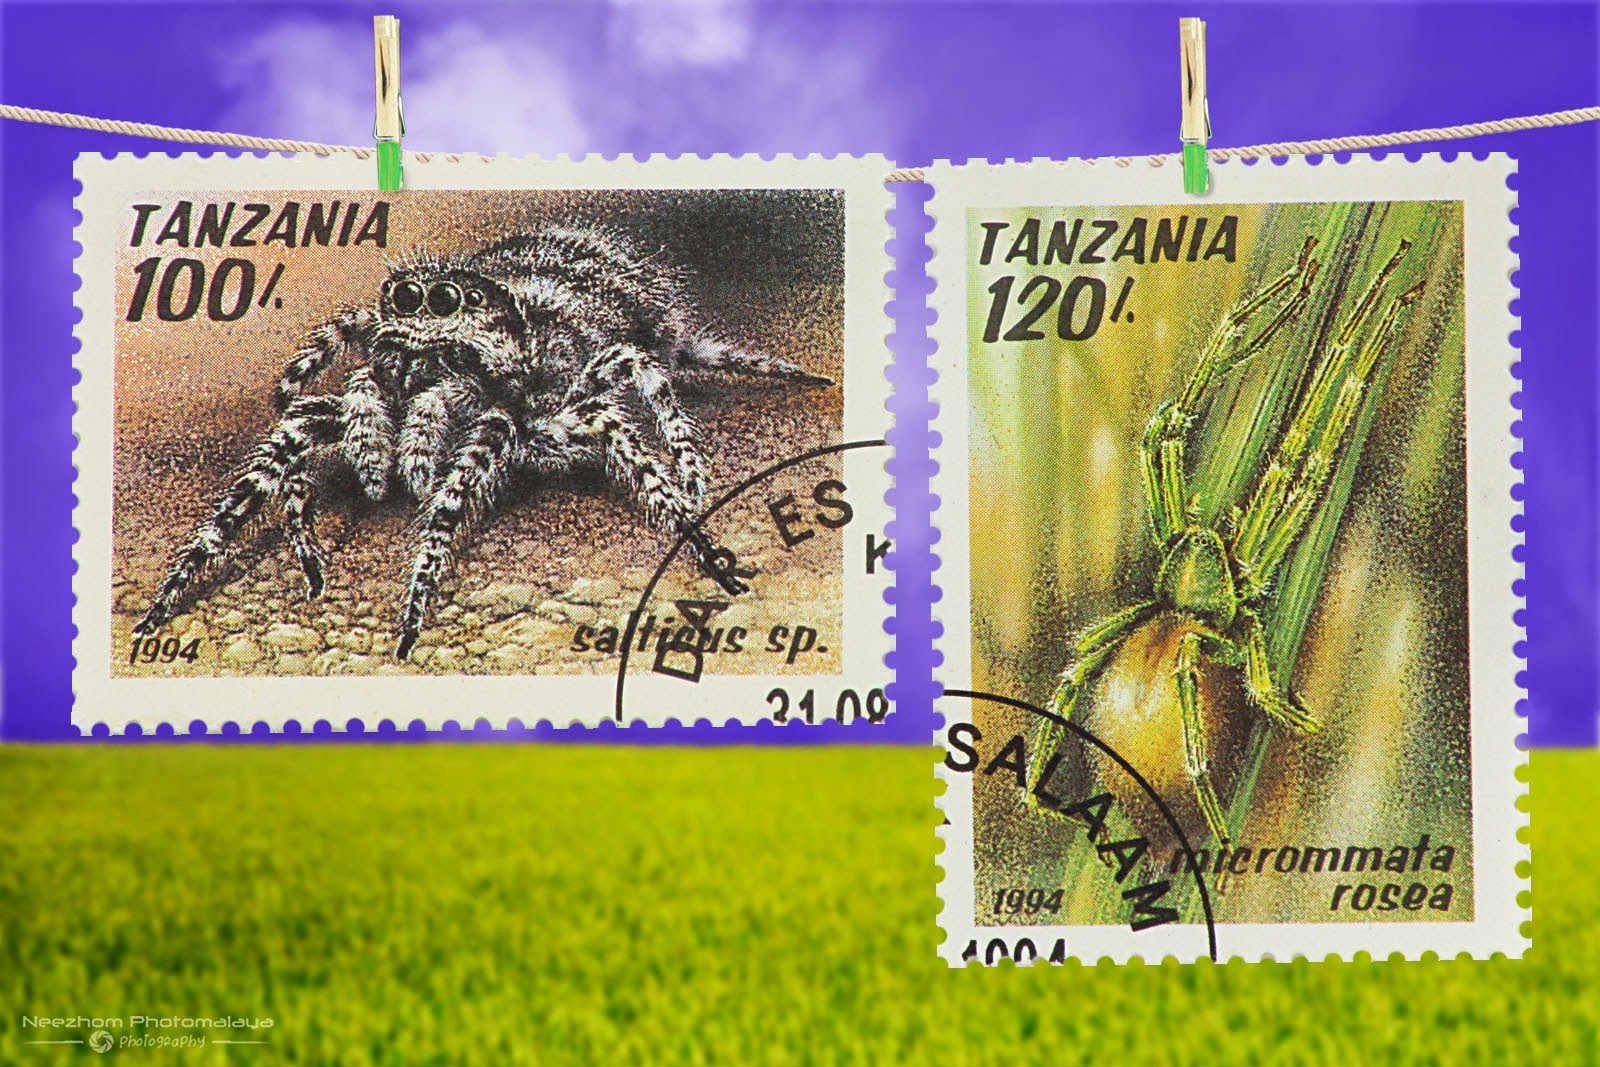 Tanzania Arachnids stamps 1994 - Salticus sp, Micrommata rosea